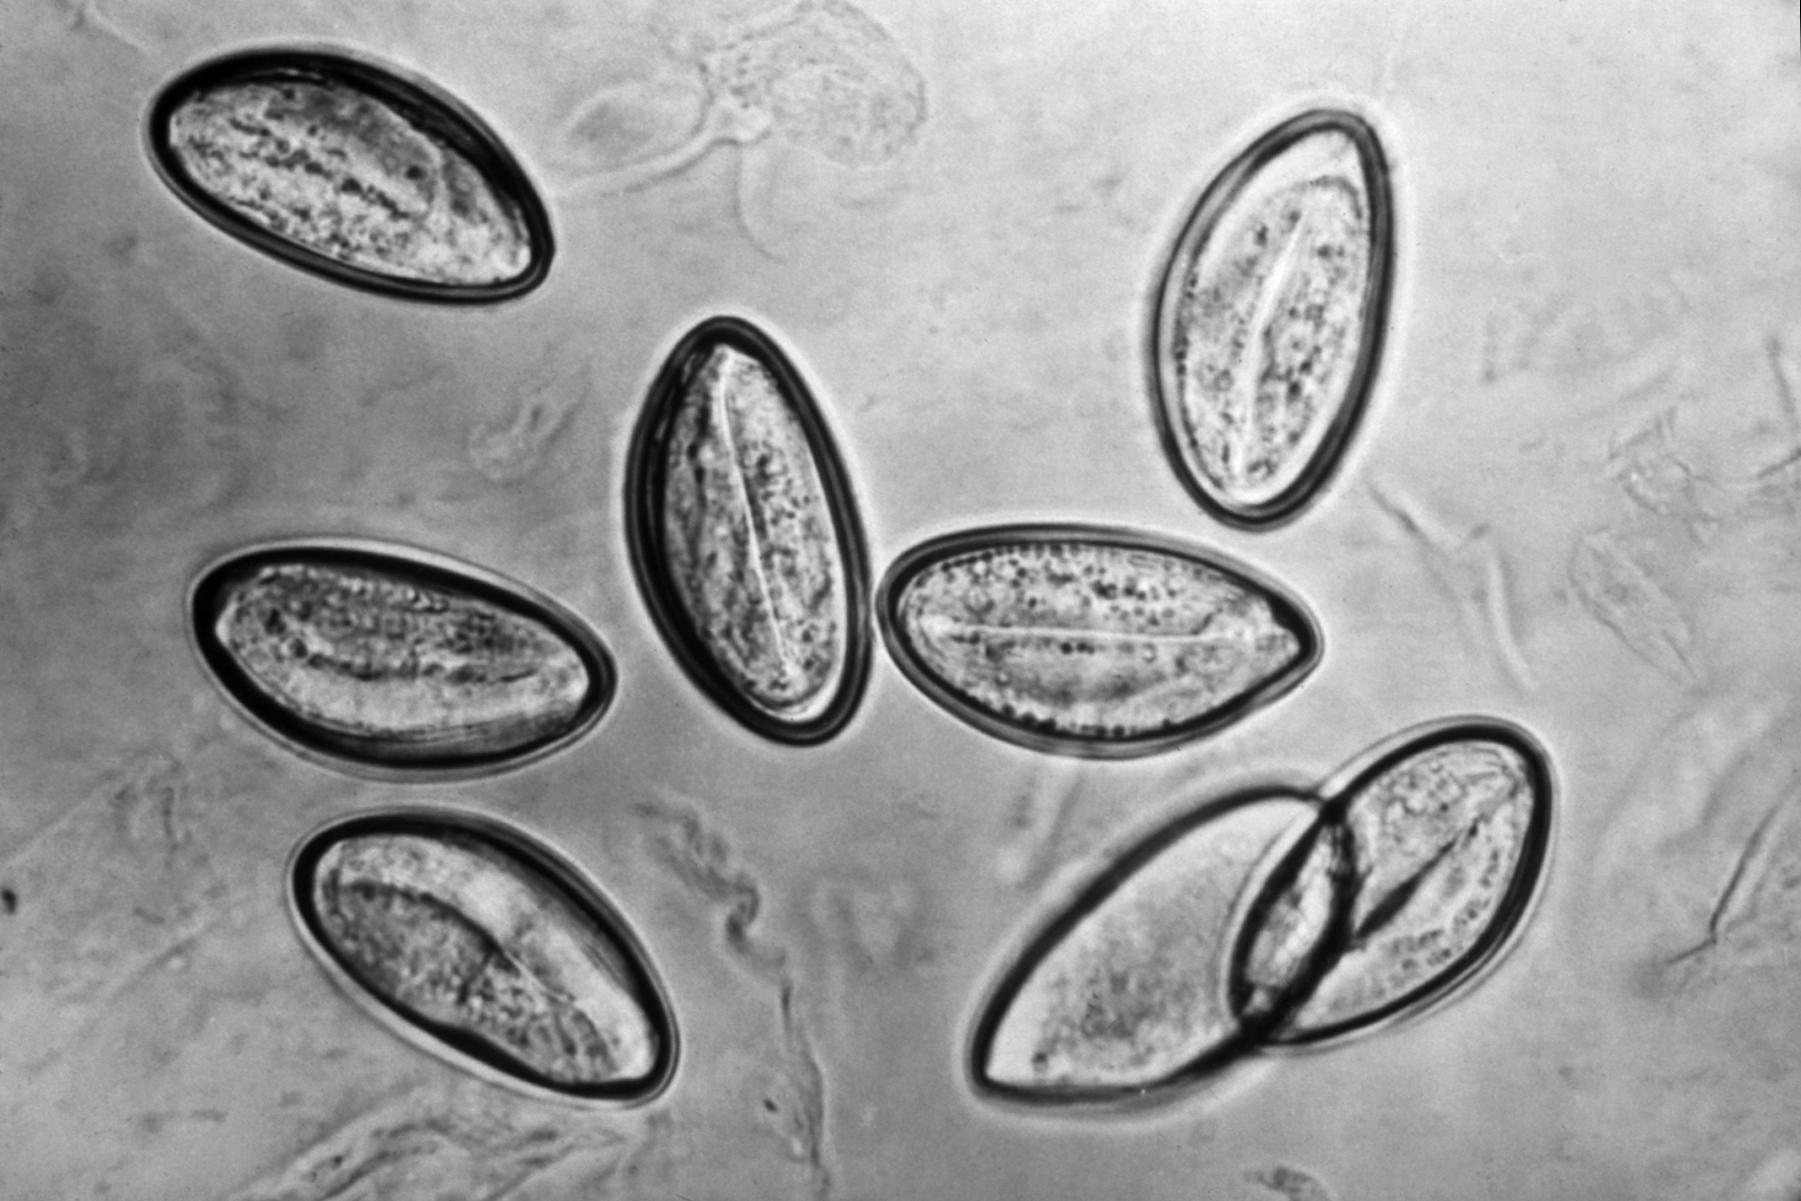 enterobiasis mucus